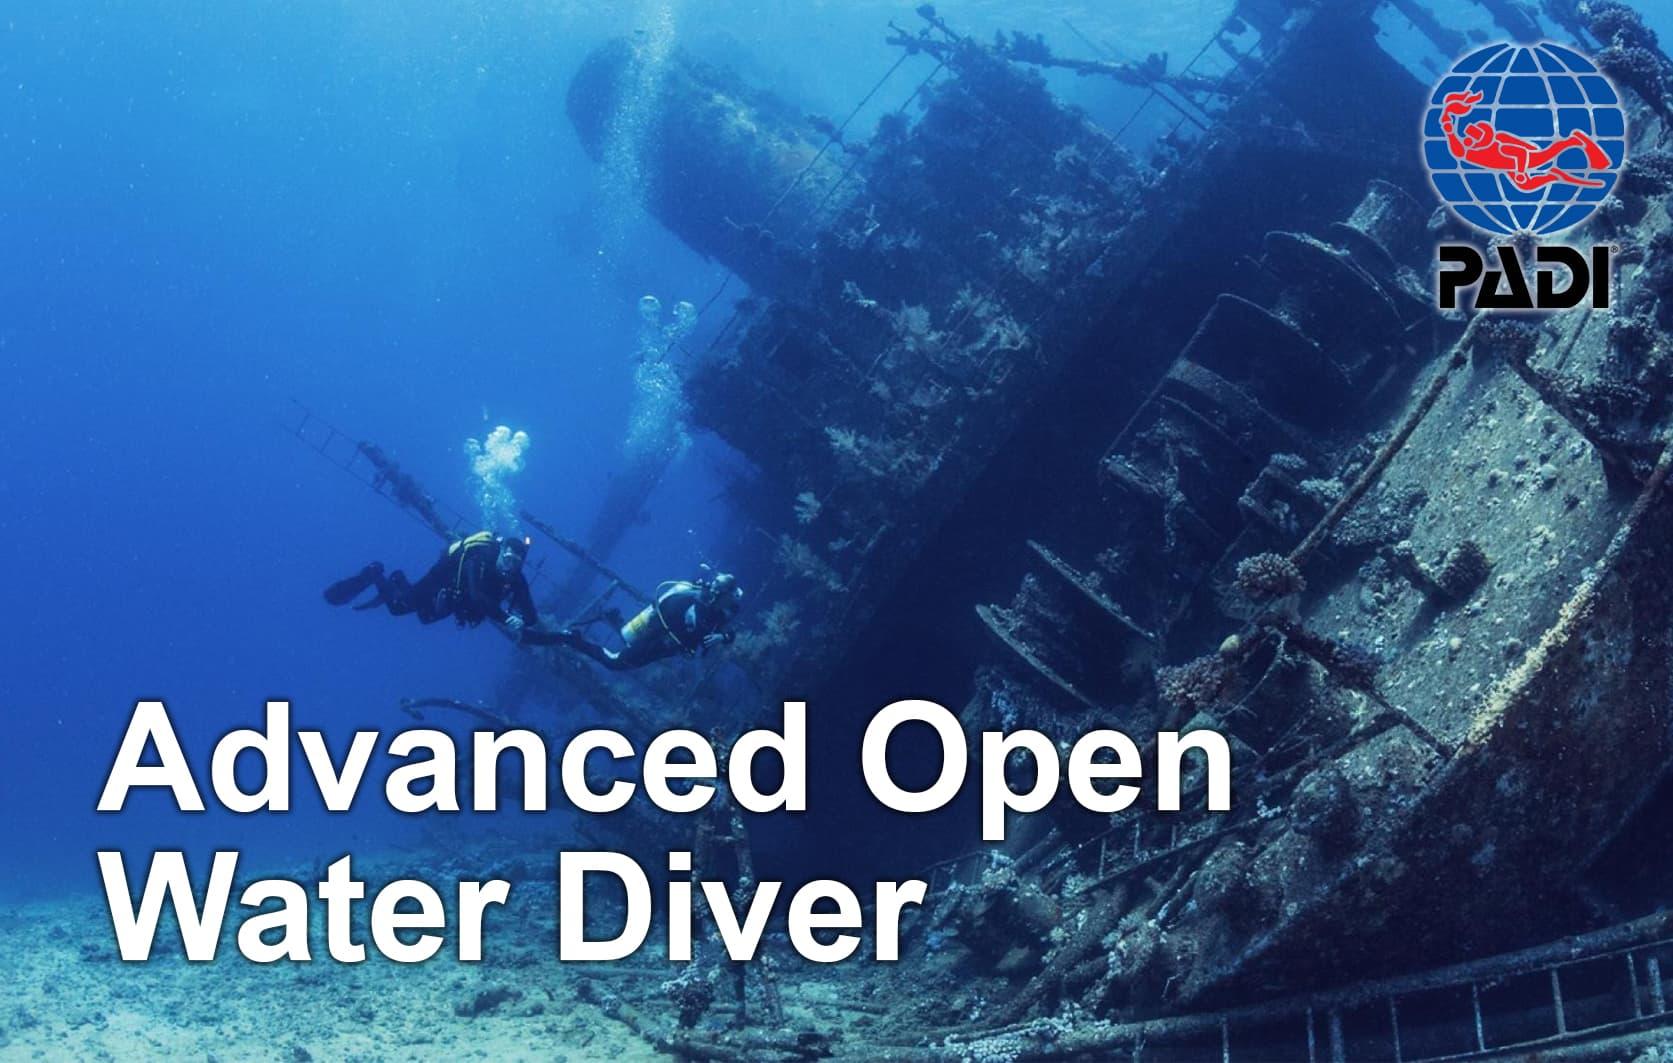 PADI Advanced Open Water Diver (AOWD) - 29.10.-01.11.2021